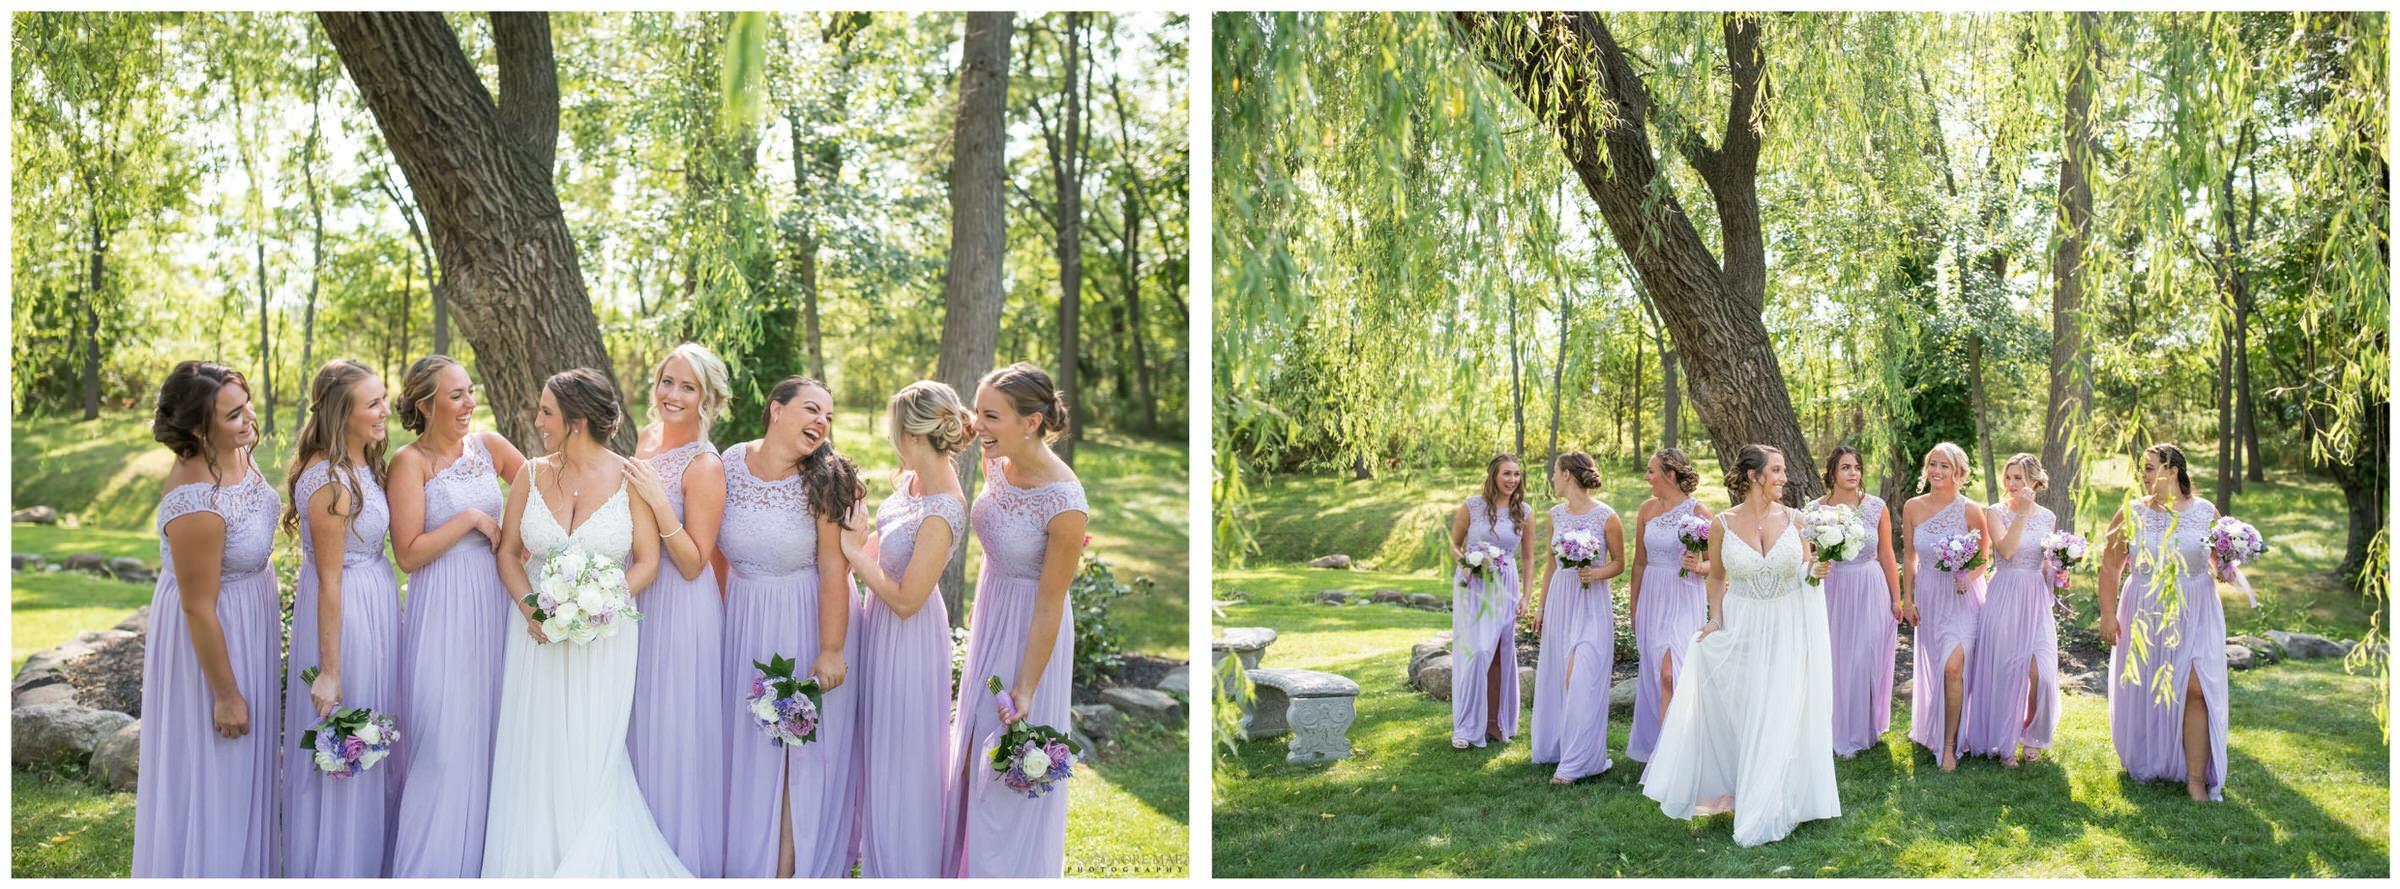 Cassondre Mae Photography Villa Venezia Wedding Photographer 19.jpg